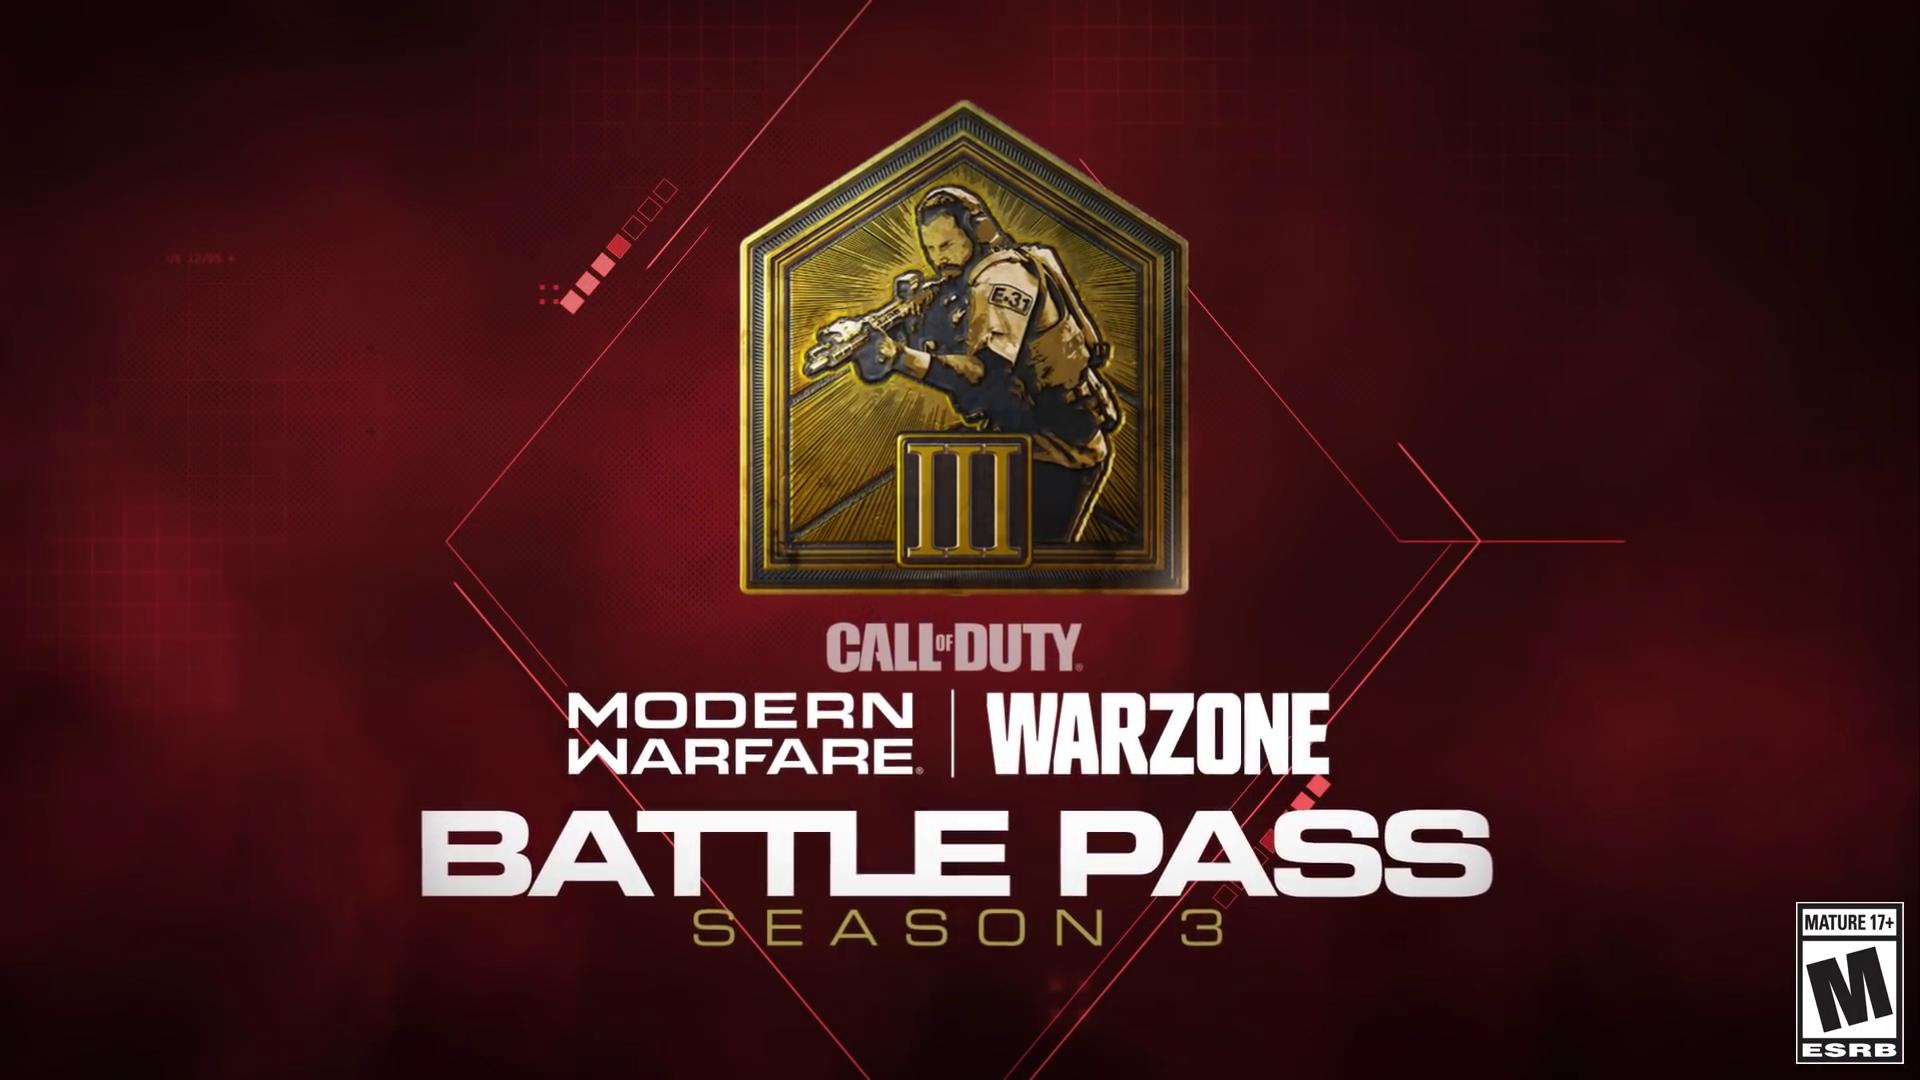 Call Of Duty Modern Warfare And Warzone Season 3 Battle Pass